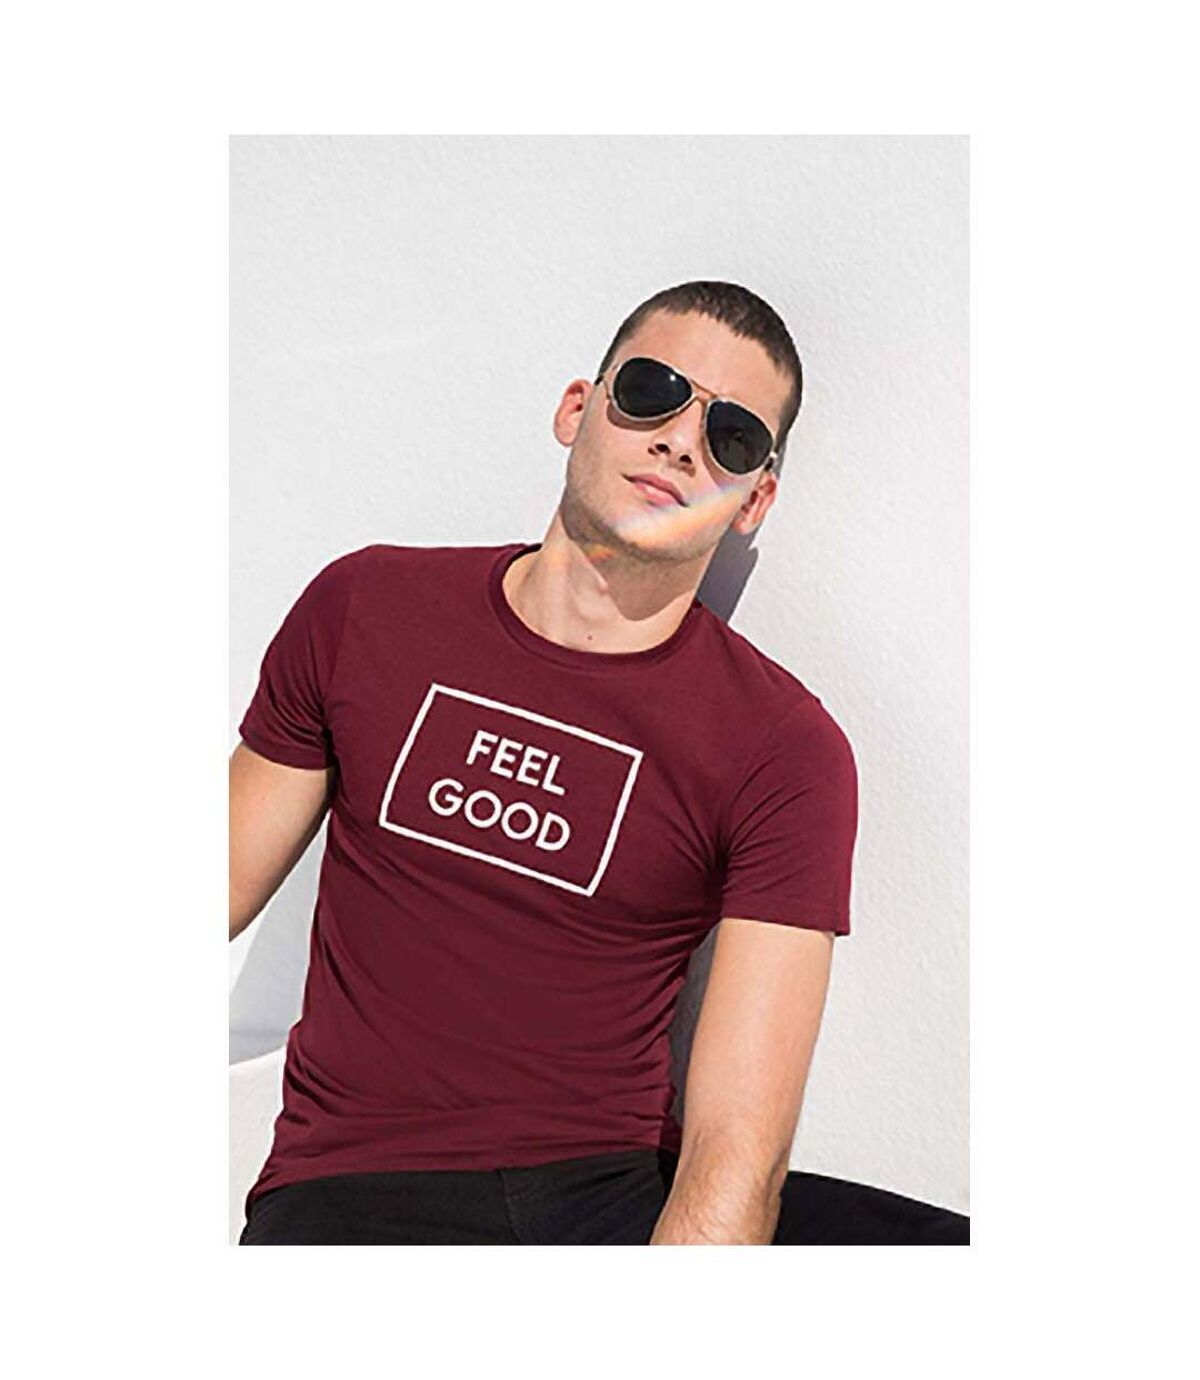 Skinni Fit - T-shirt manches courtes FEEL GOOD - Homme (Bordeaux) - UTRW4427